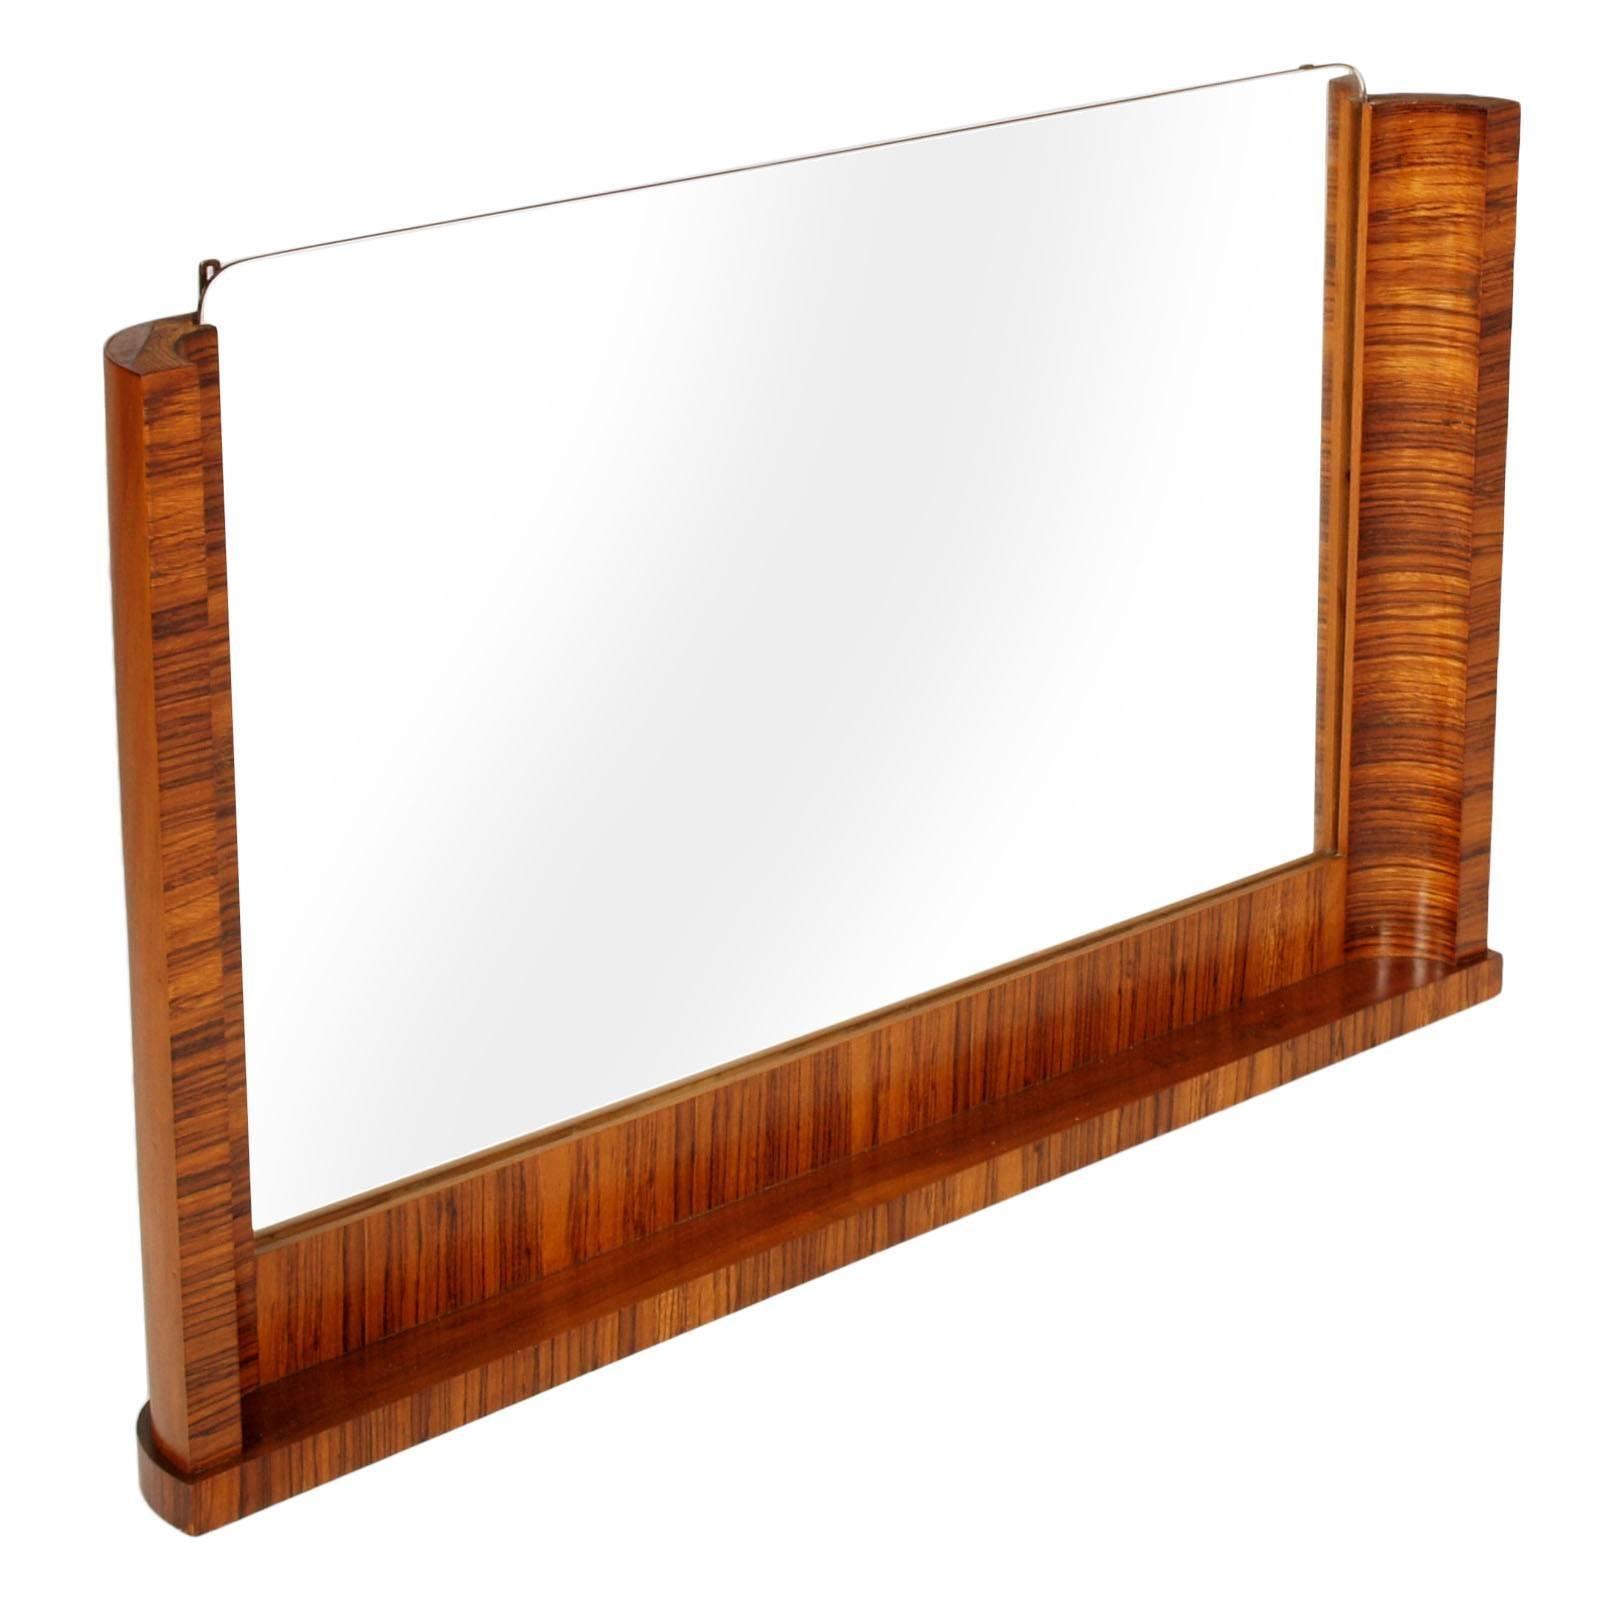 Italian Art Decò Wall Mirror Osvaldo Borsani Attributed in Macassar Ebony